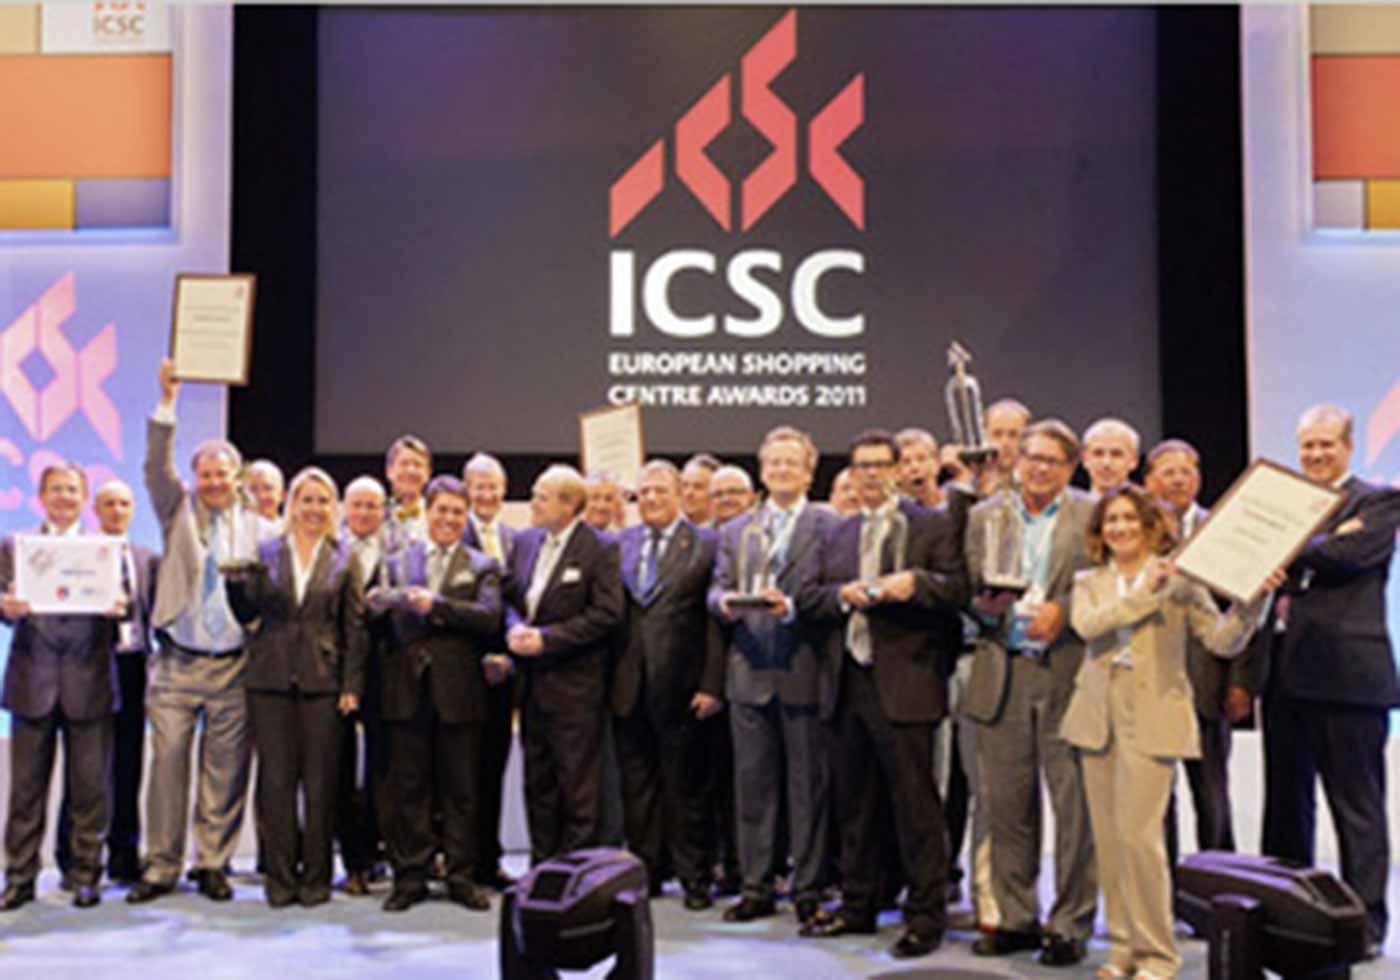 ICSC-Jury mit ATP-CEO Christoph M. Achammer